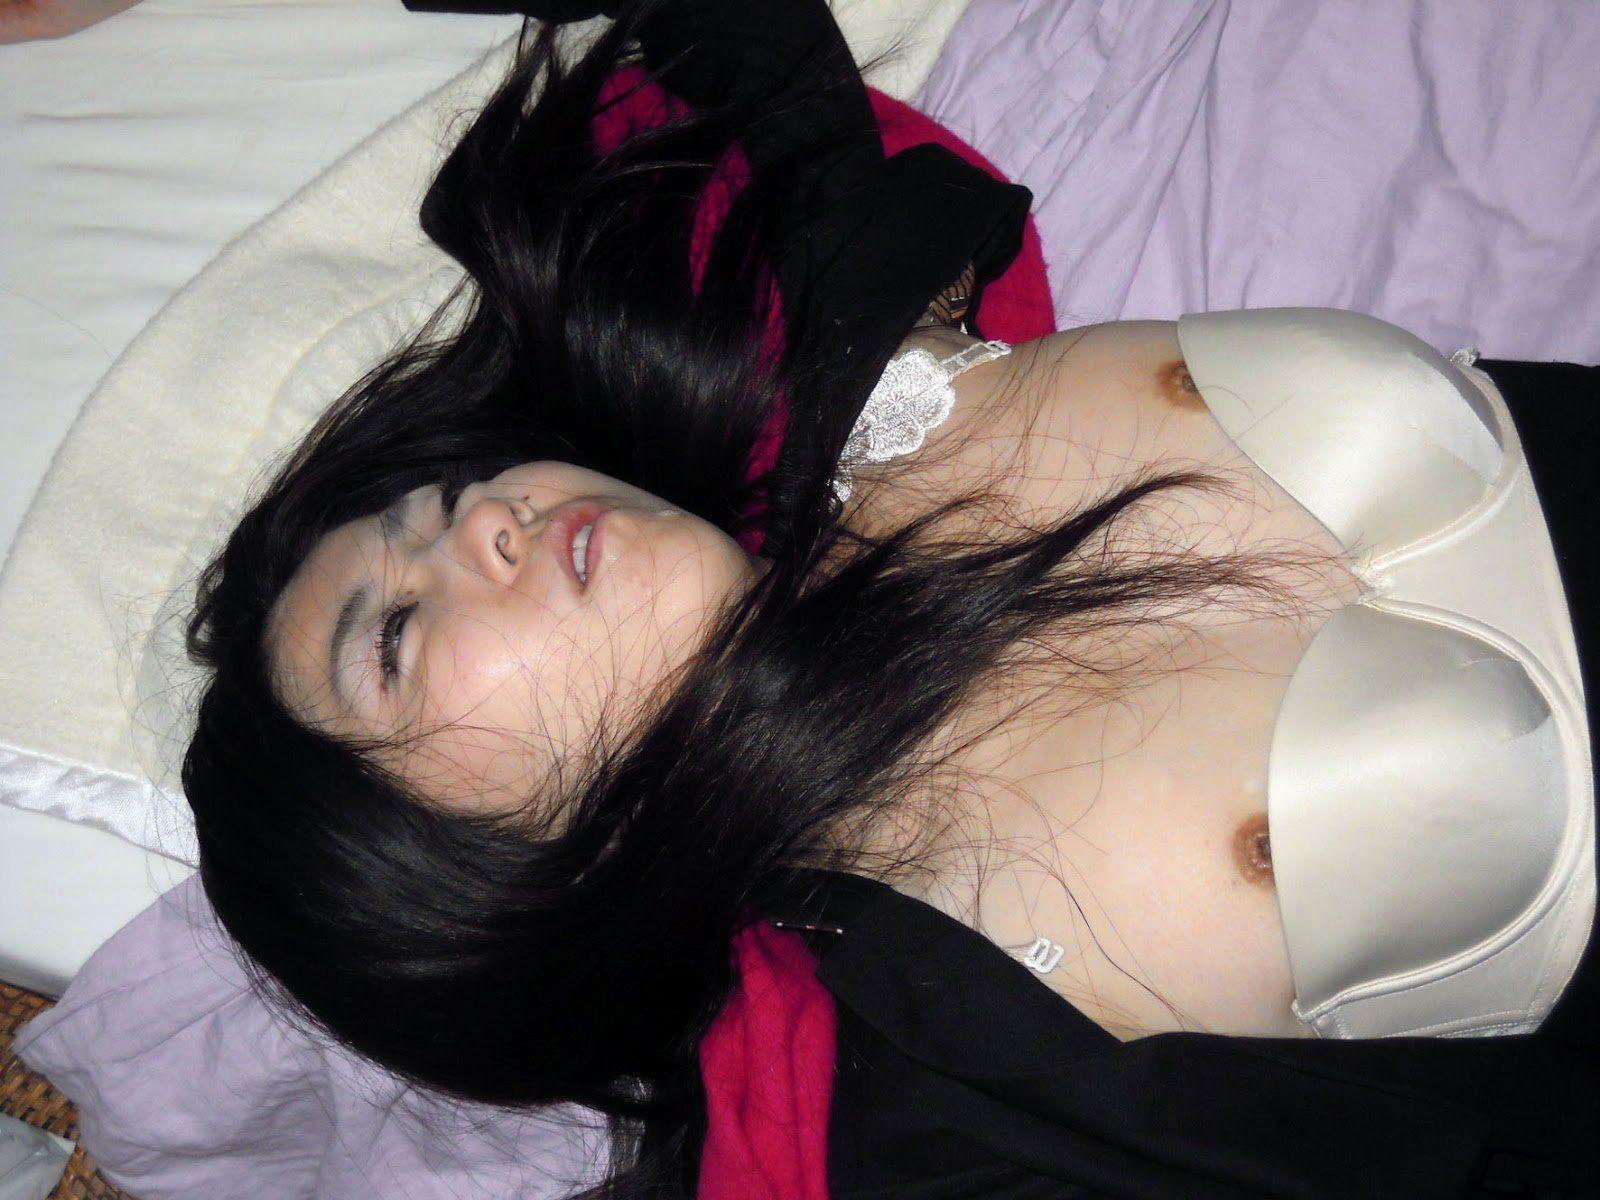 Rough milf oral sex